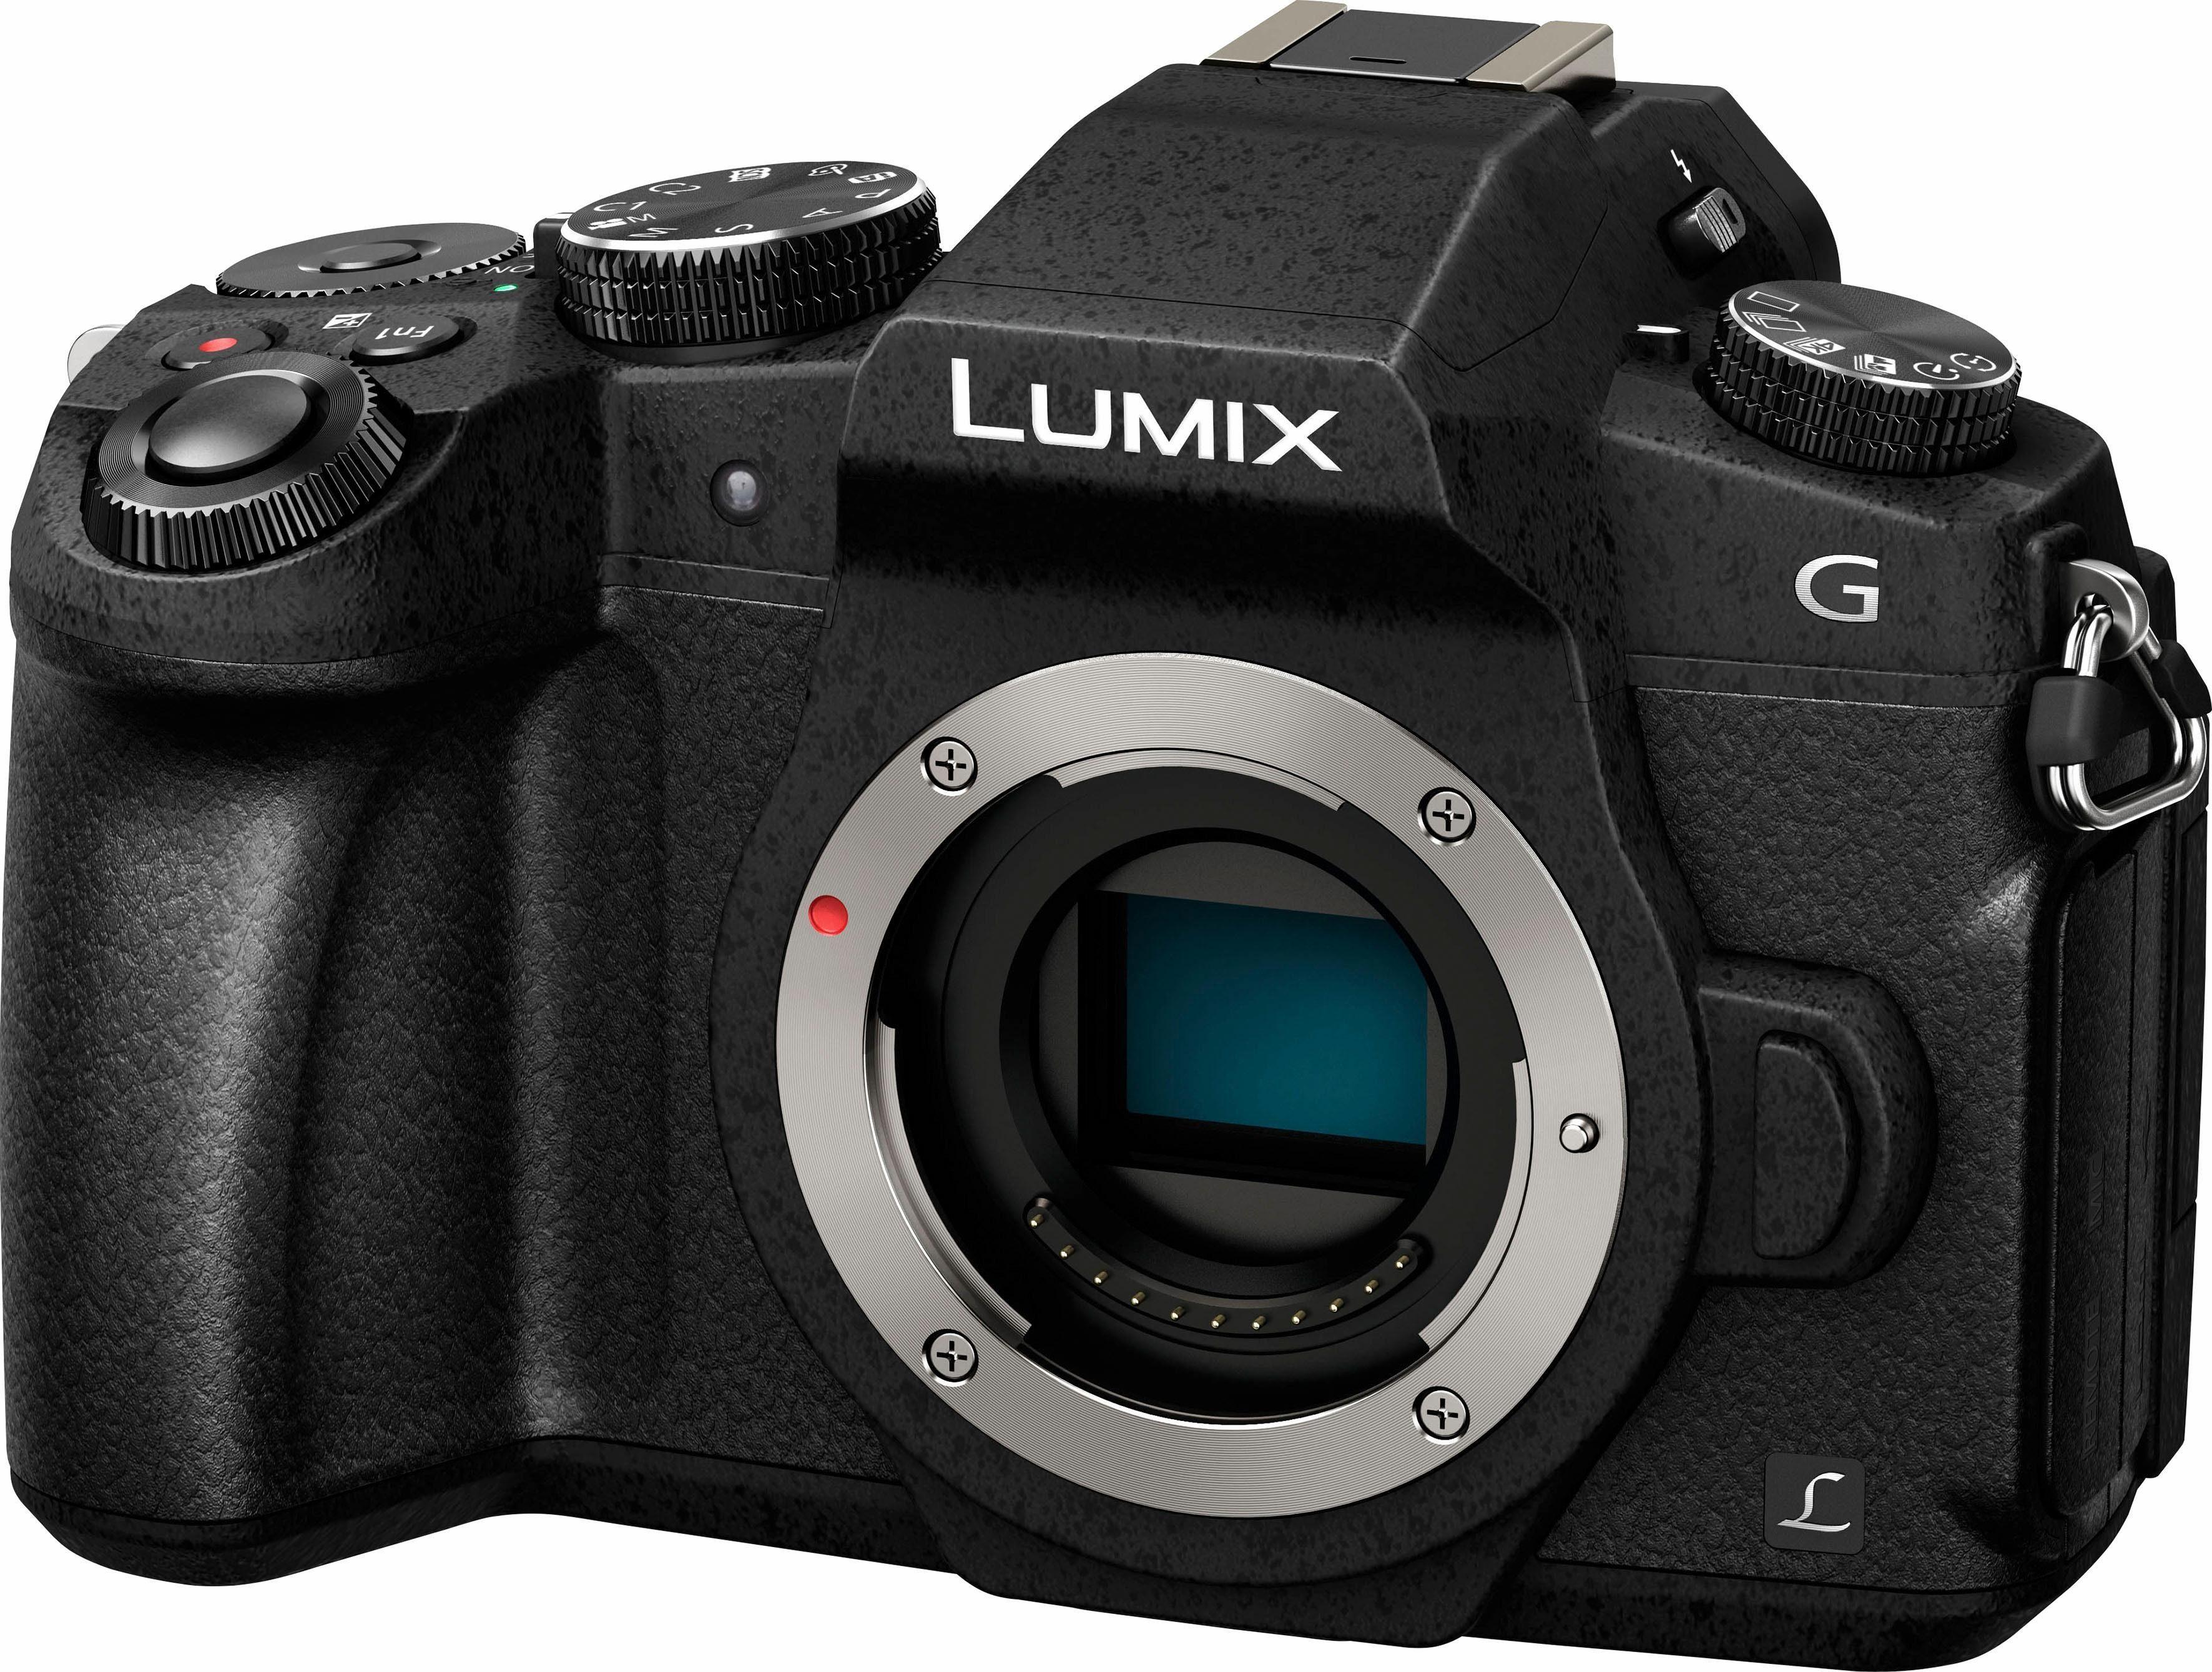 Panasonic Lumix DMC-G81EG-K Body